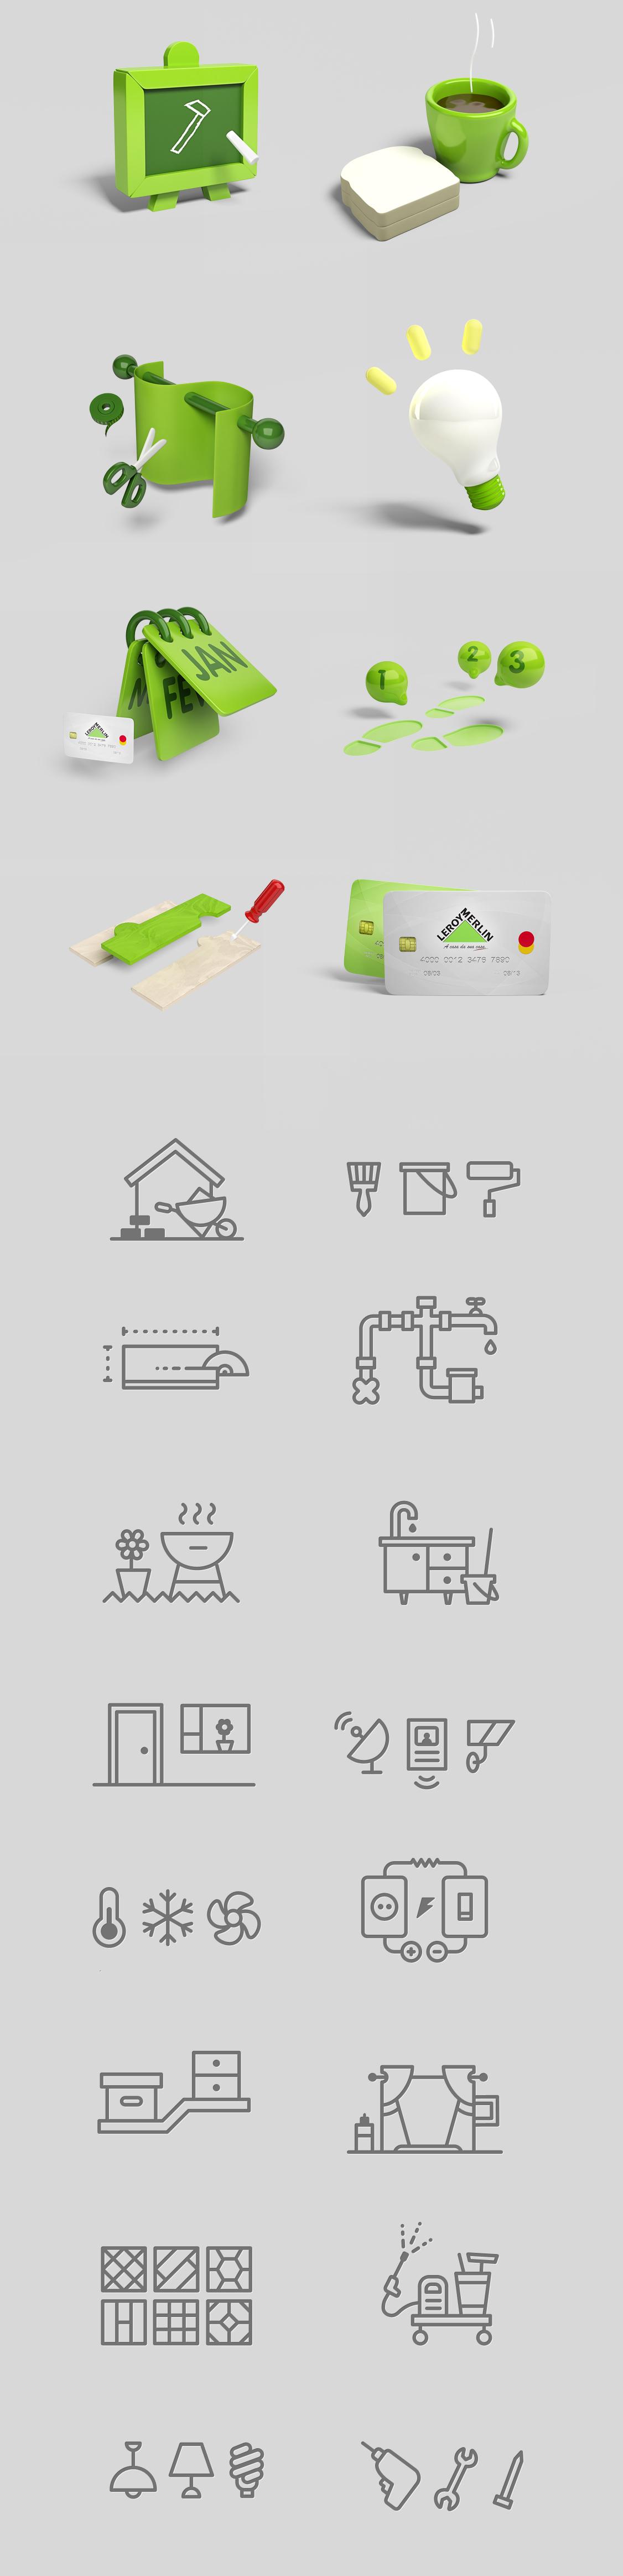 Leroy Merlin Diegojose Design Grafico Desenhos Simples Desenhos